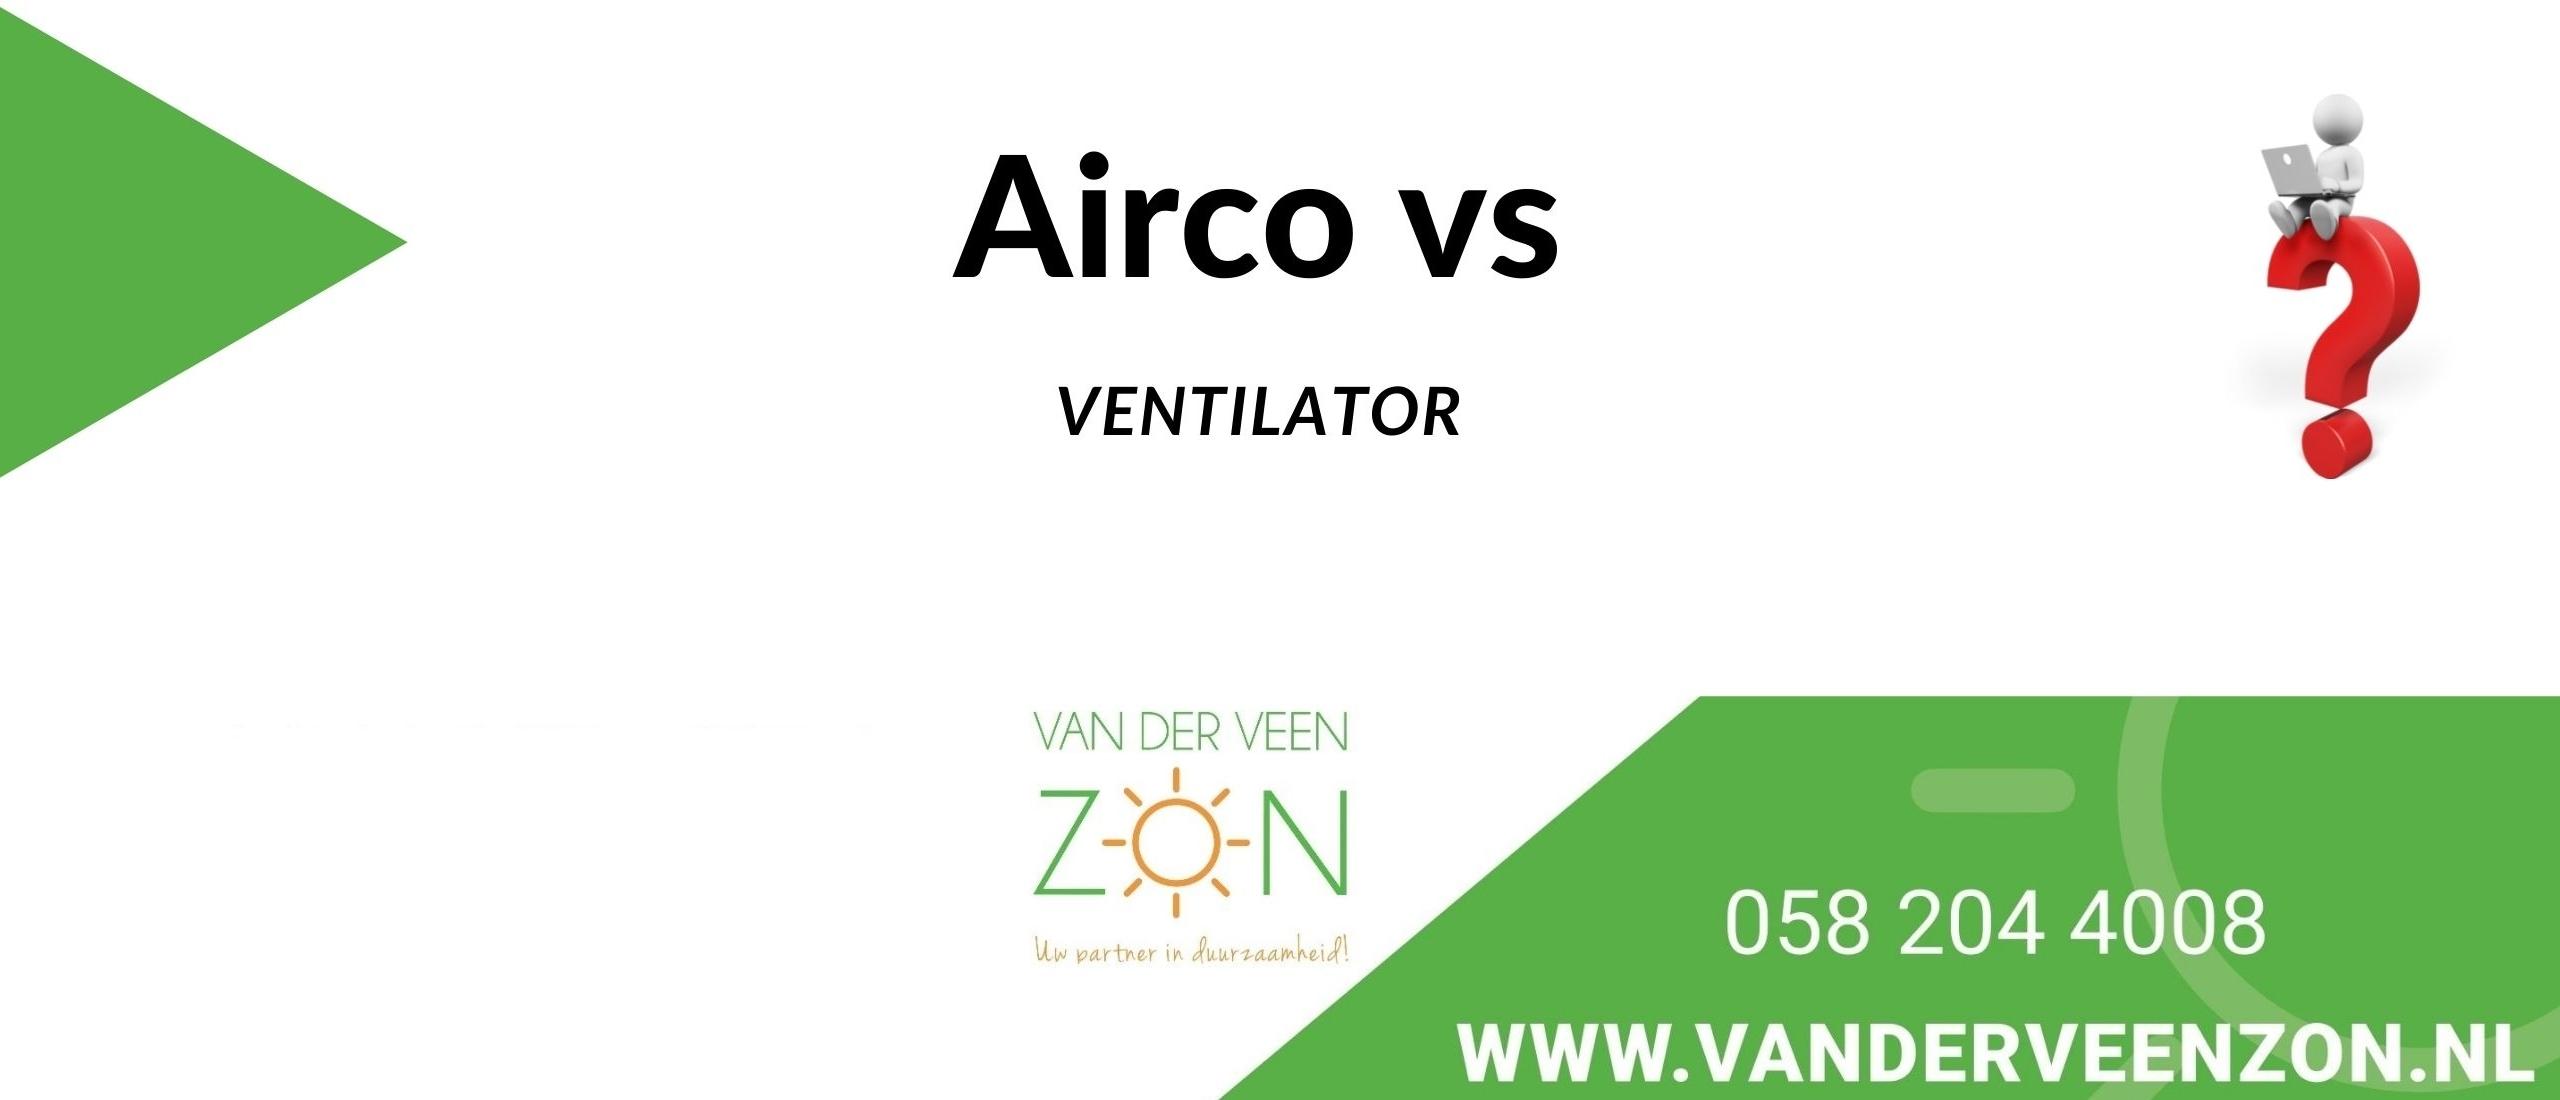 airco versus ventilator